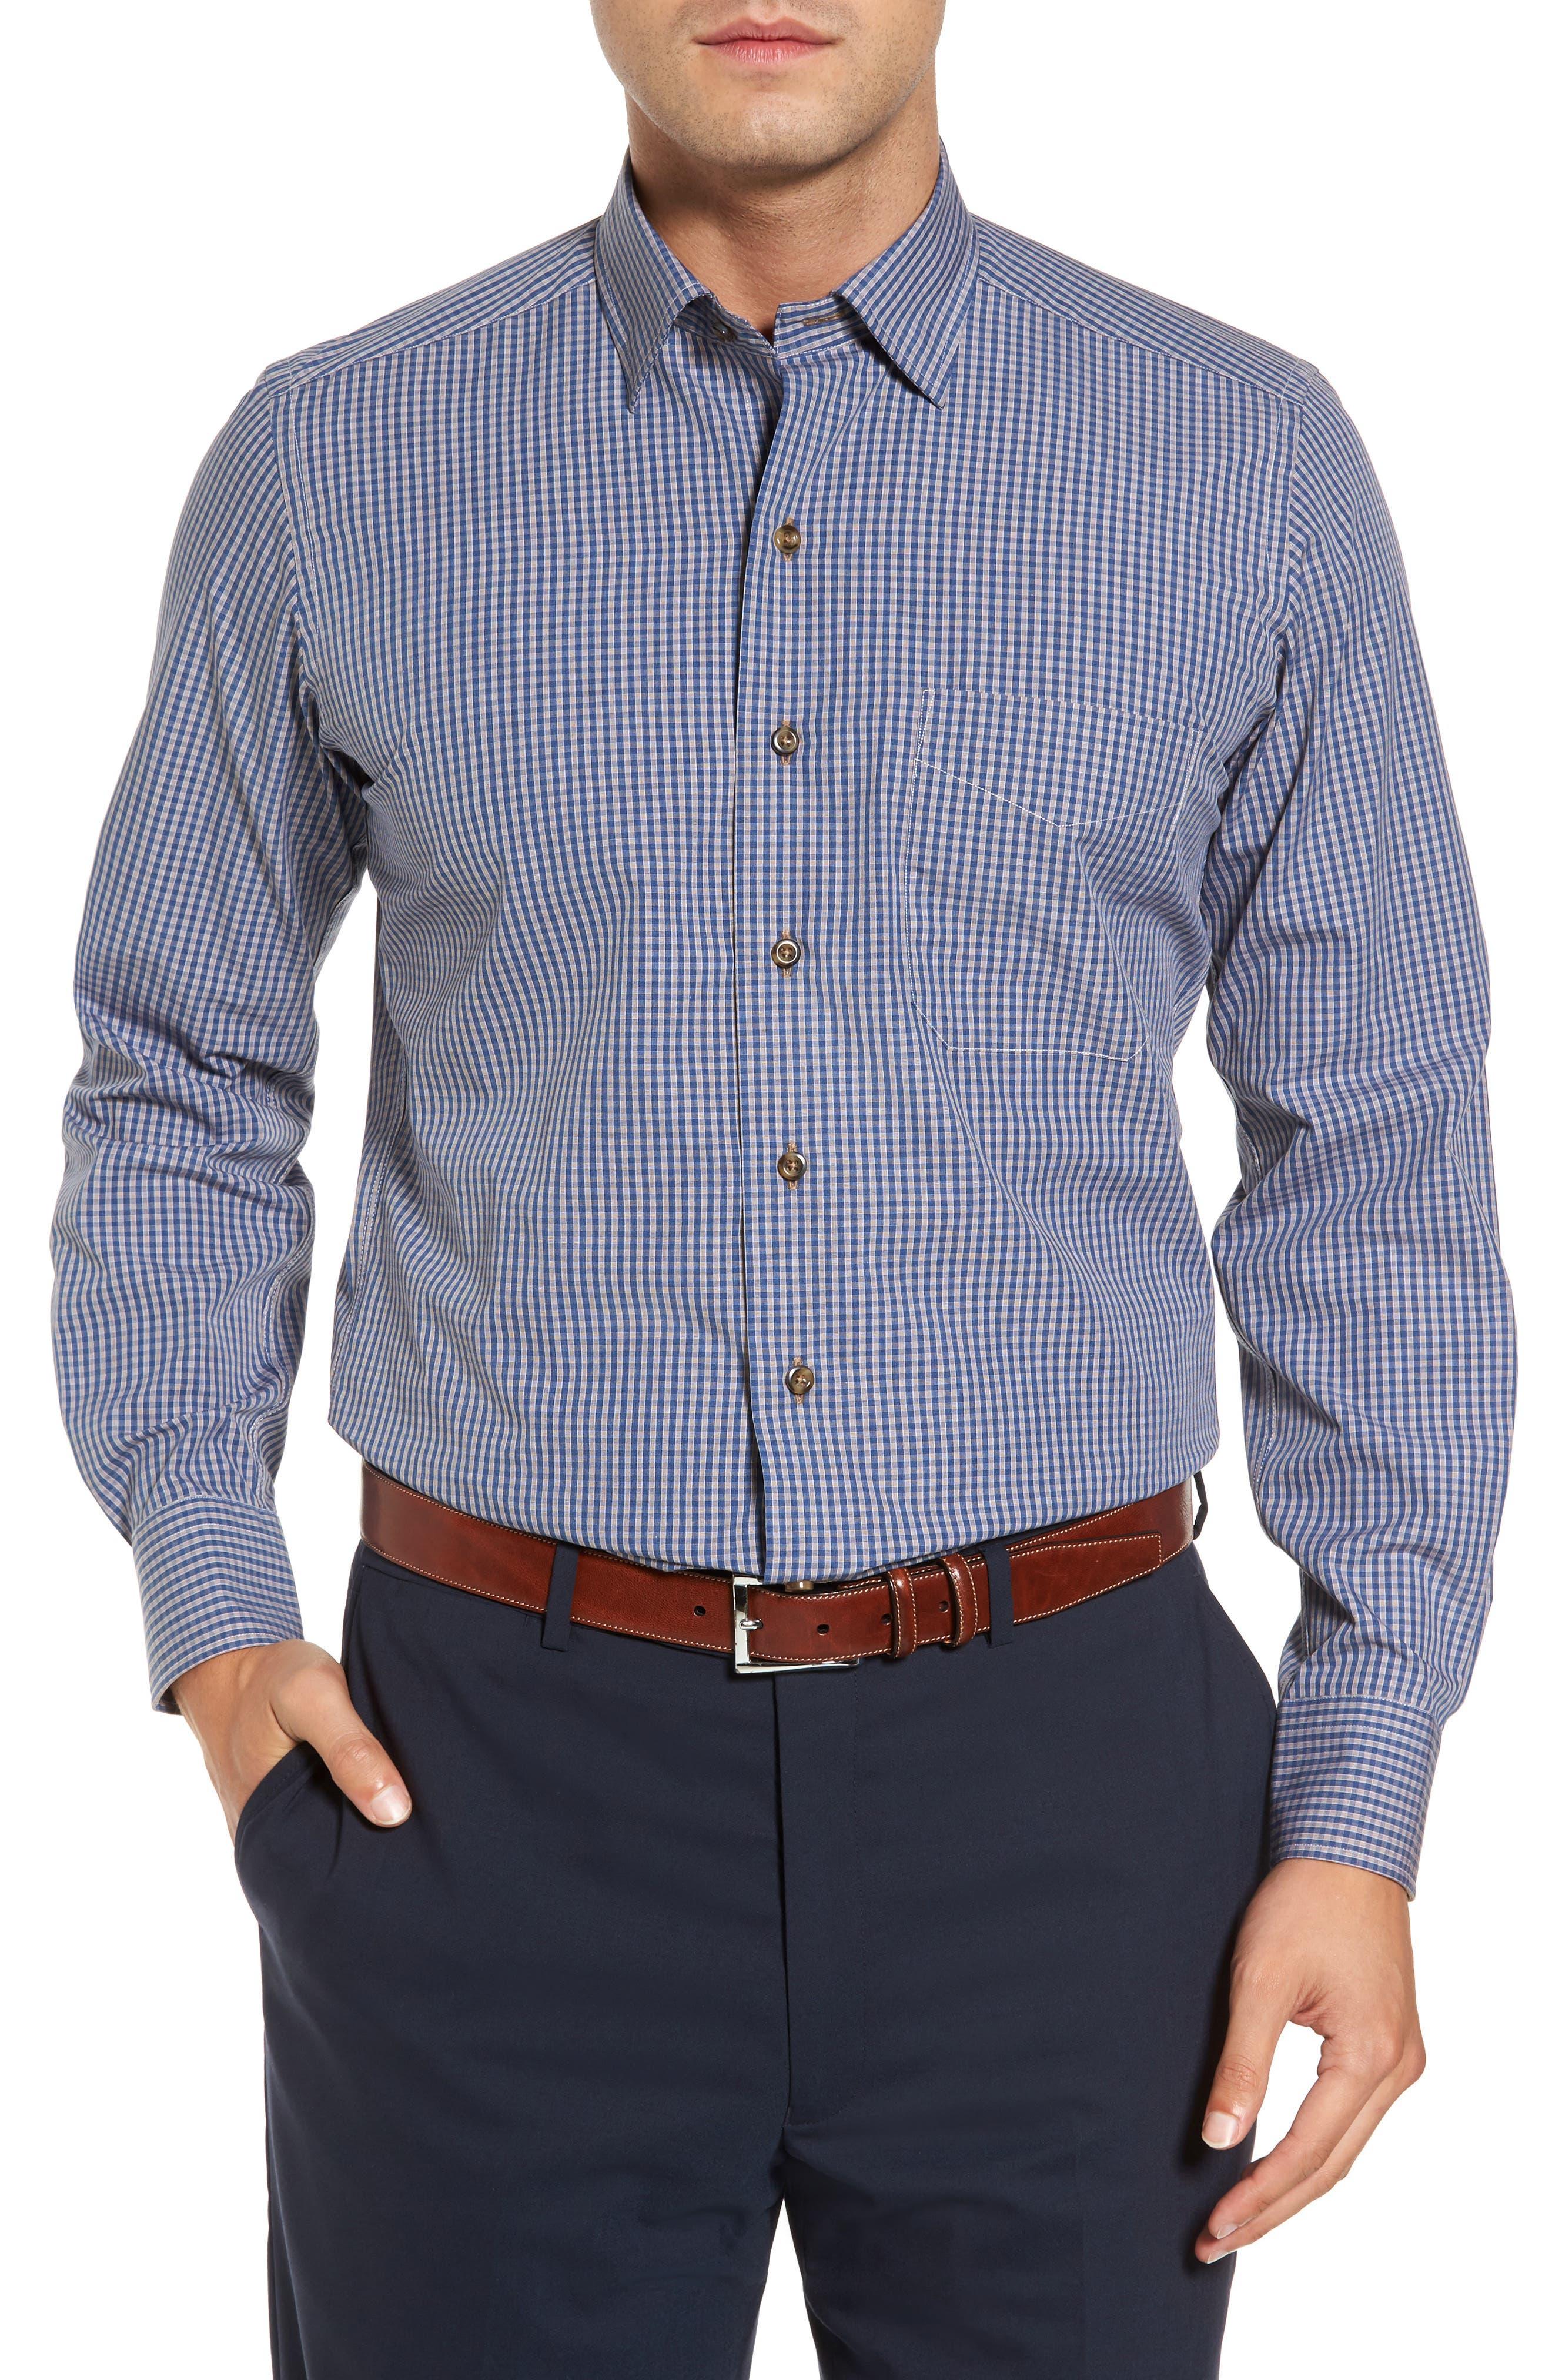 Regular Fit Check Sport Shirt,                         Main,                         color, Navy/ Chocolate